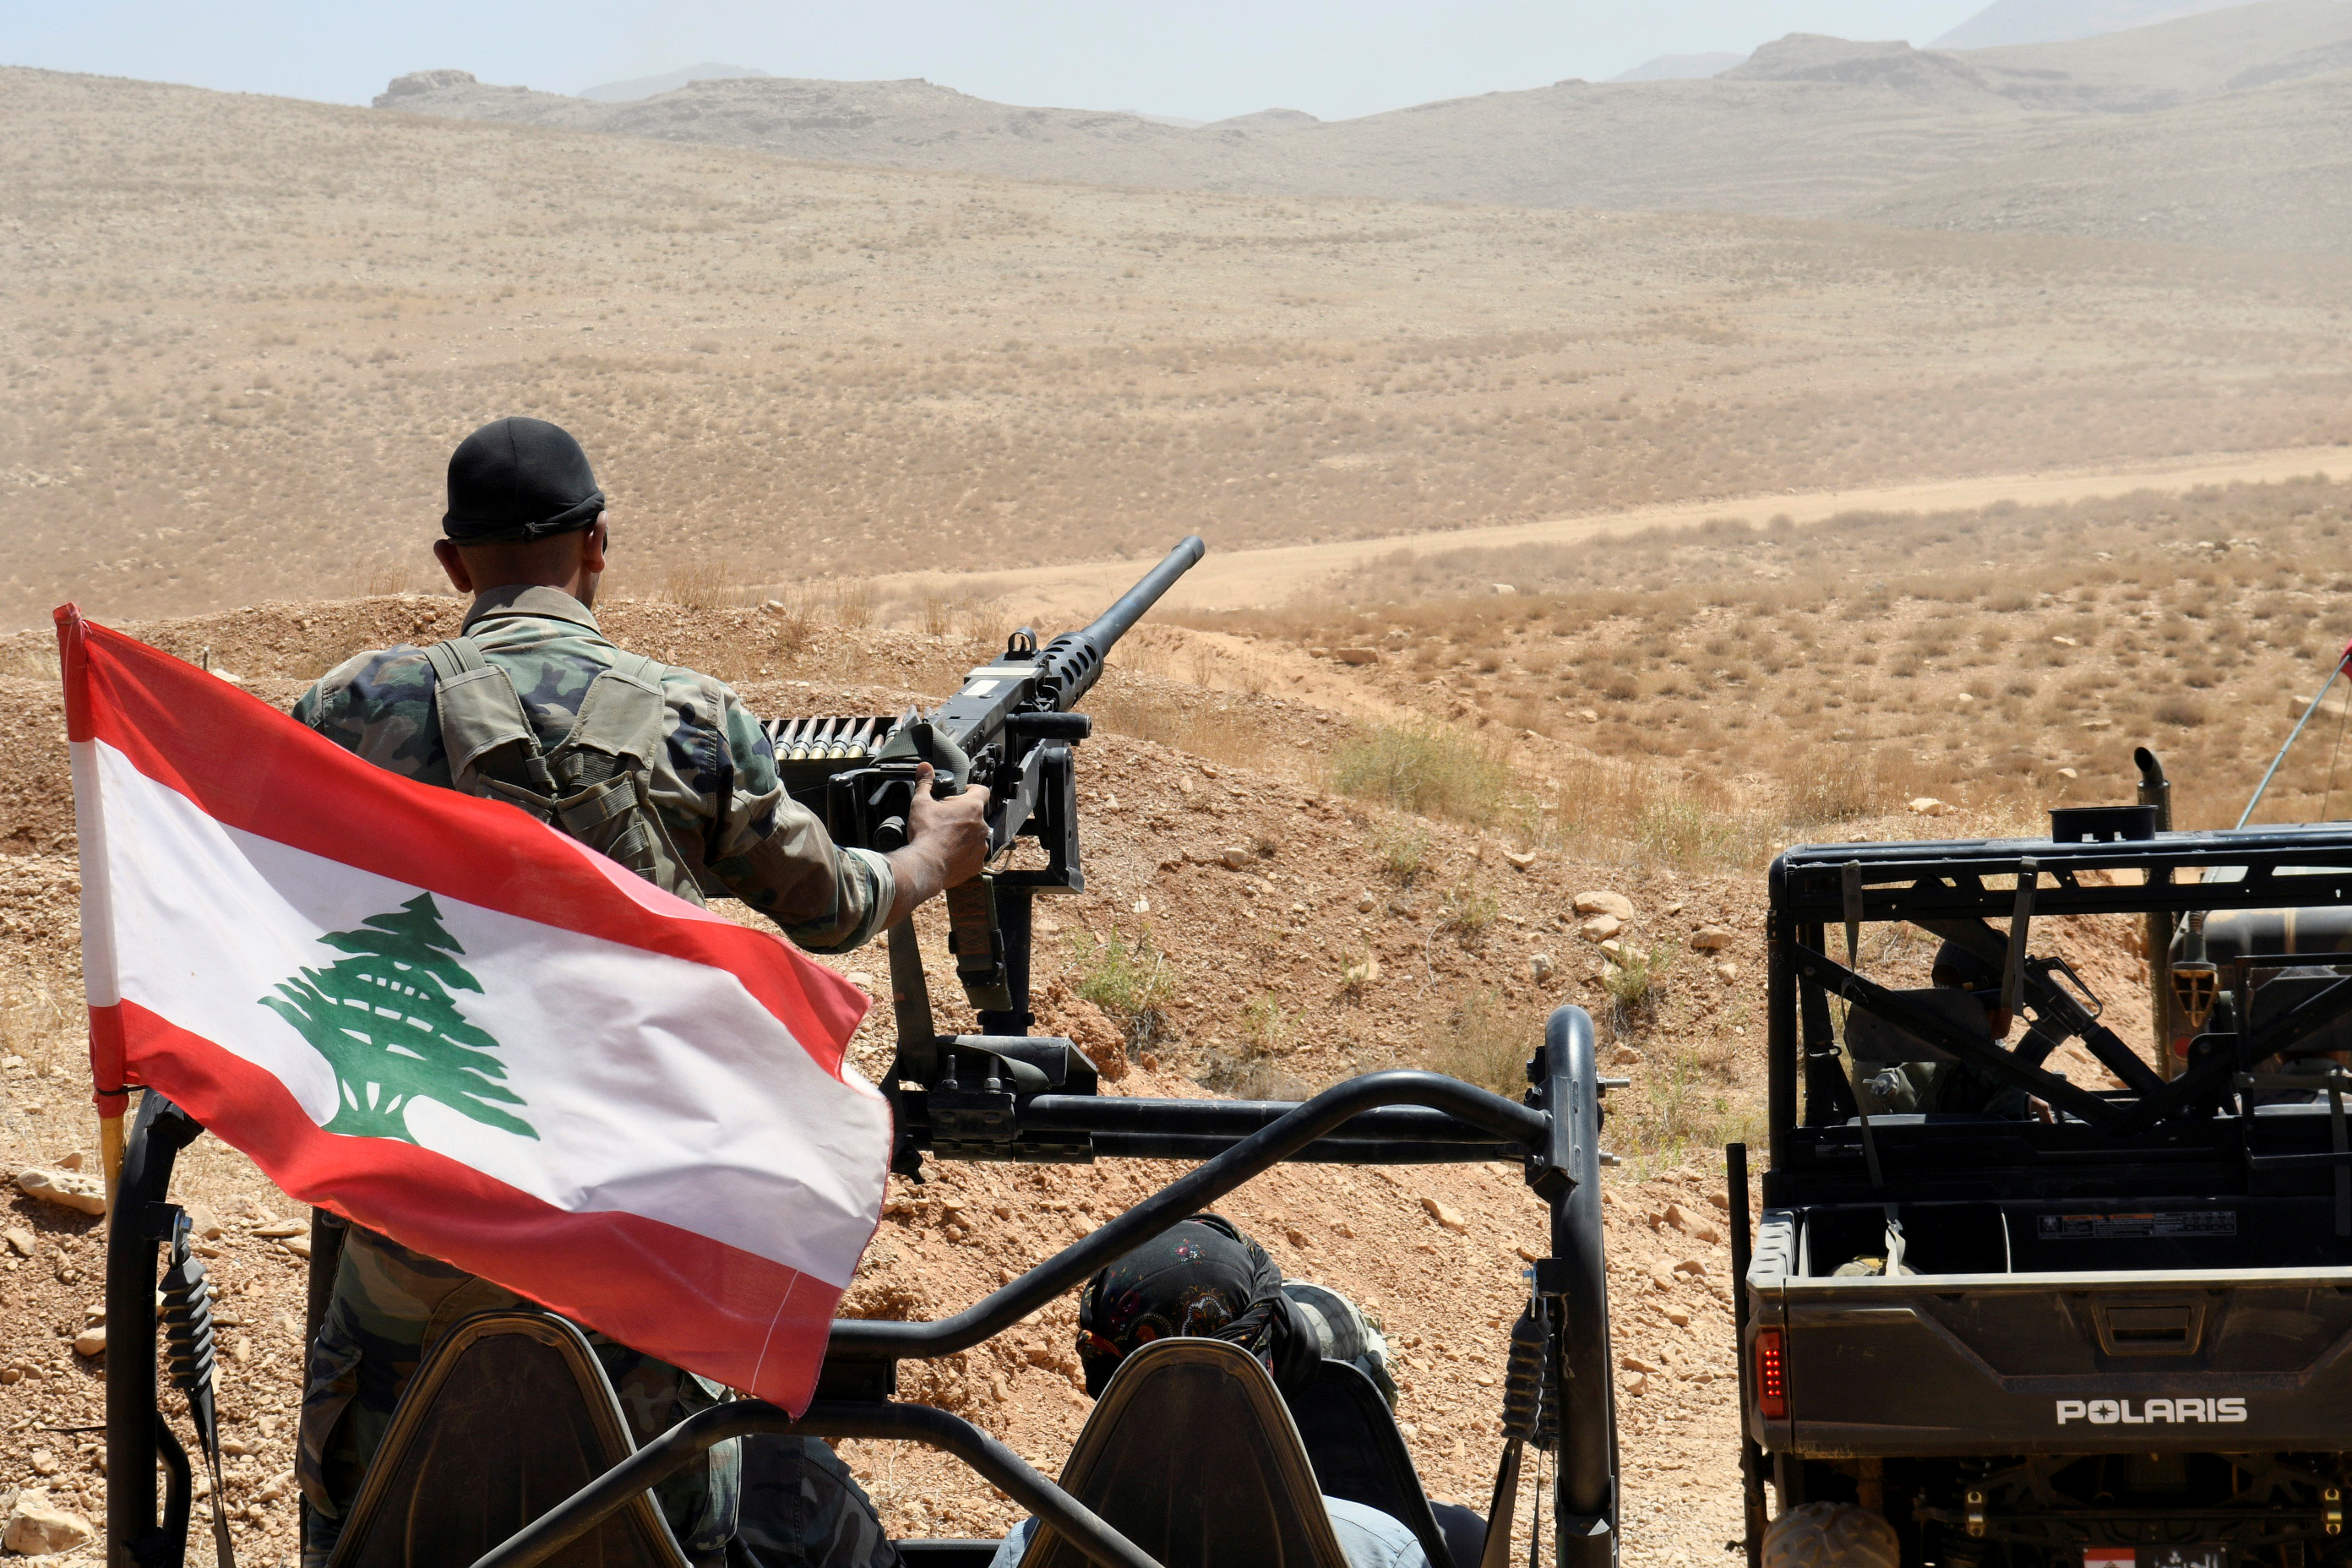 Lebanese Army soldiers ride on their military vehicles in Ras Baalbek